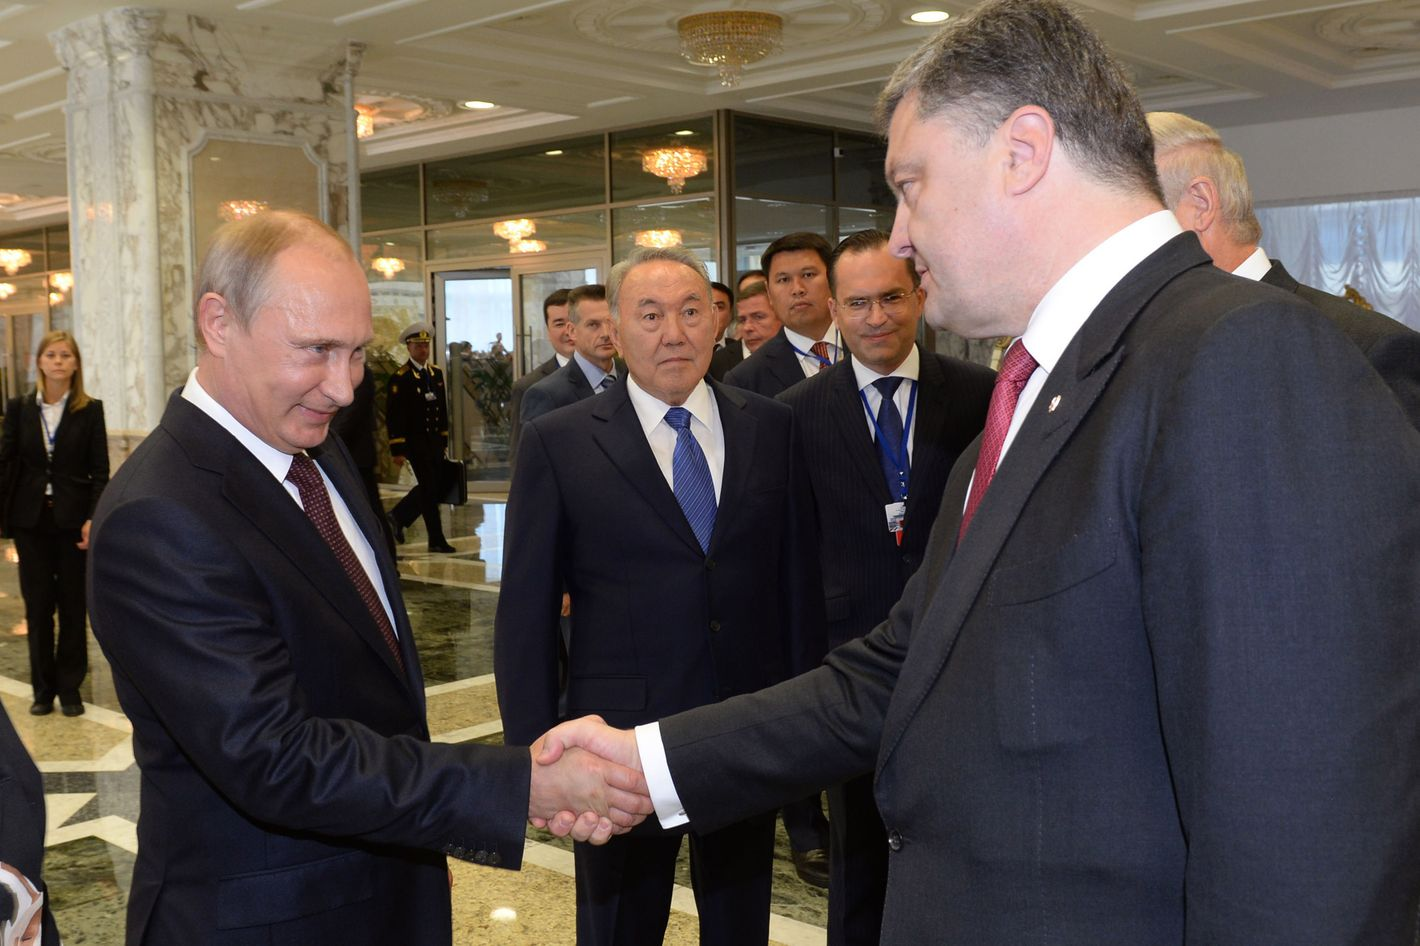 (L-R) EU Vice-President Catherine Ashton, Russian President Vladimir Putin, Kazakh President Nursultan Nazarbayev and Ukrainian President Petro Poroshenko attend the Ukraine Summit In Minsk, Belarus on August 26, 2014.